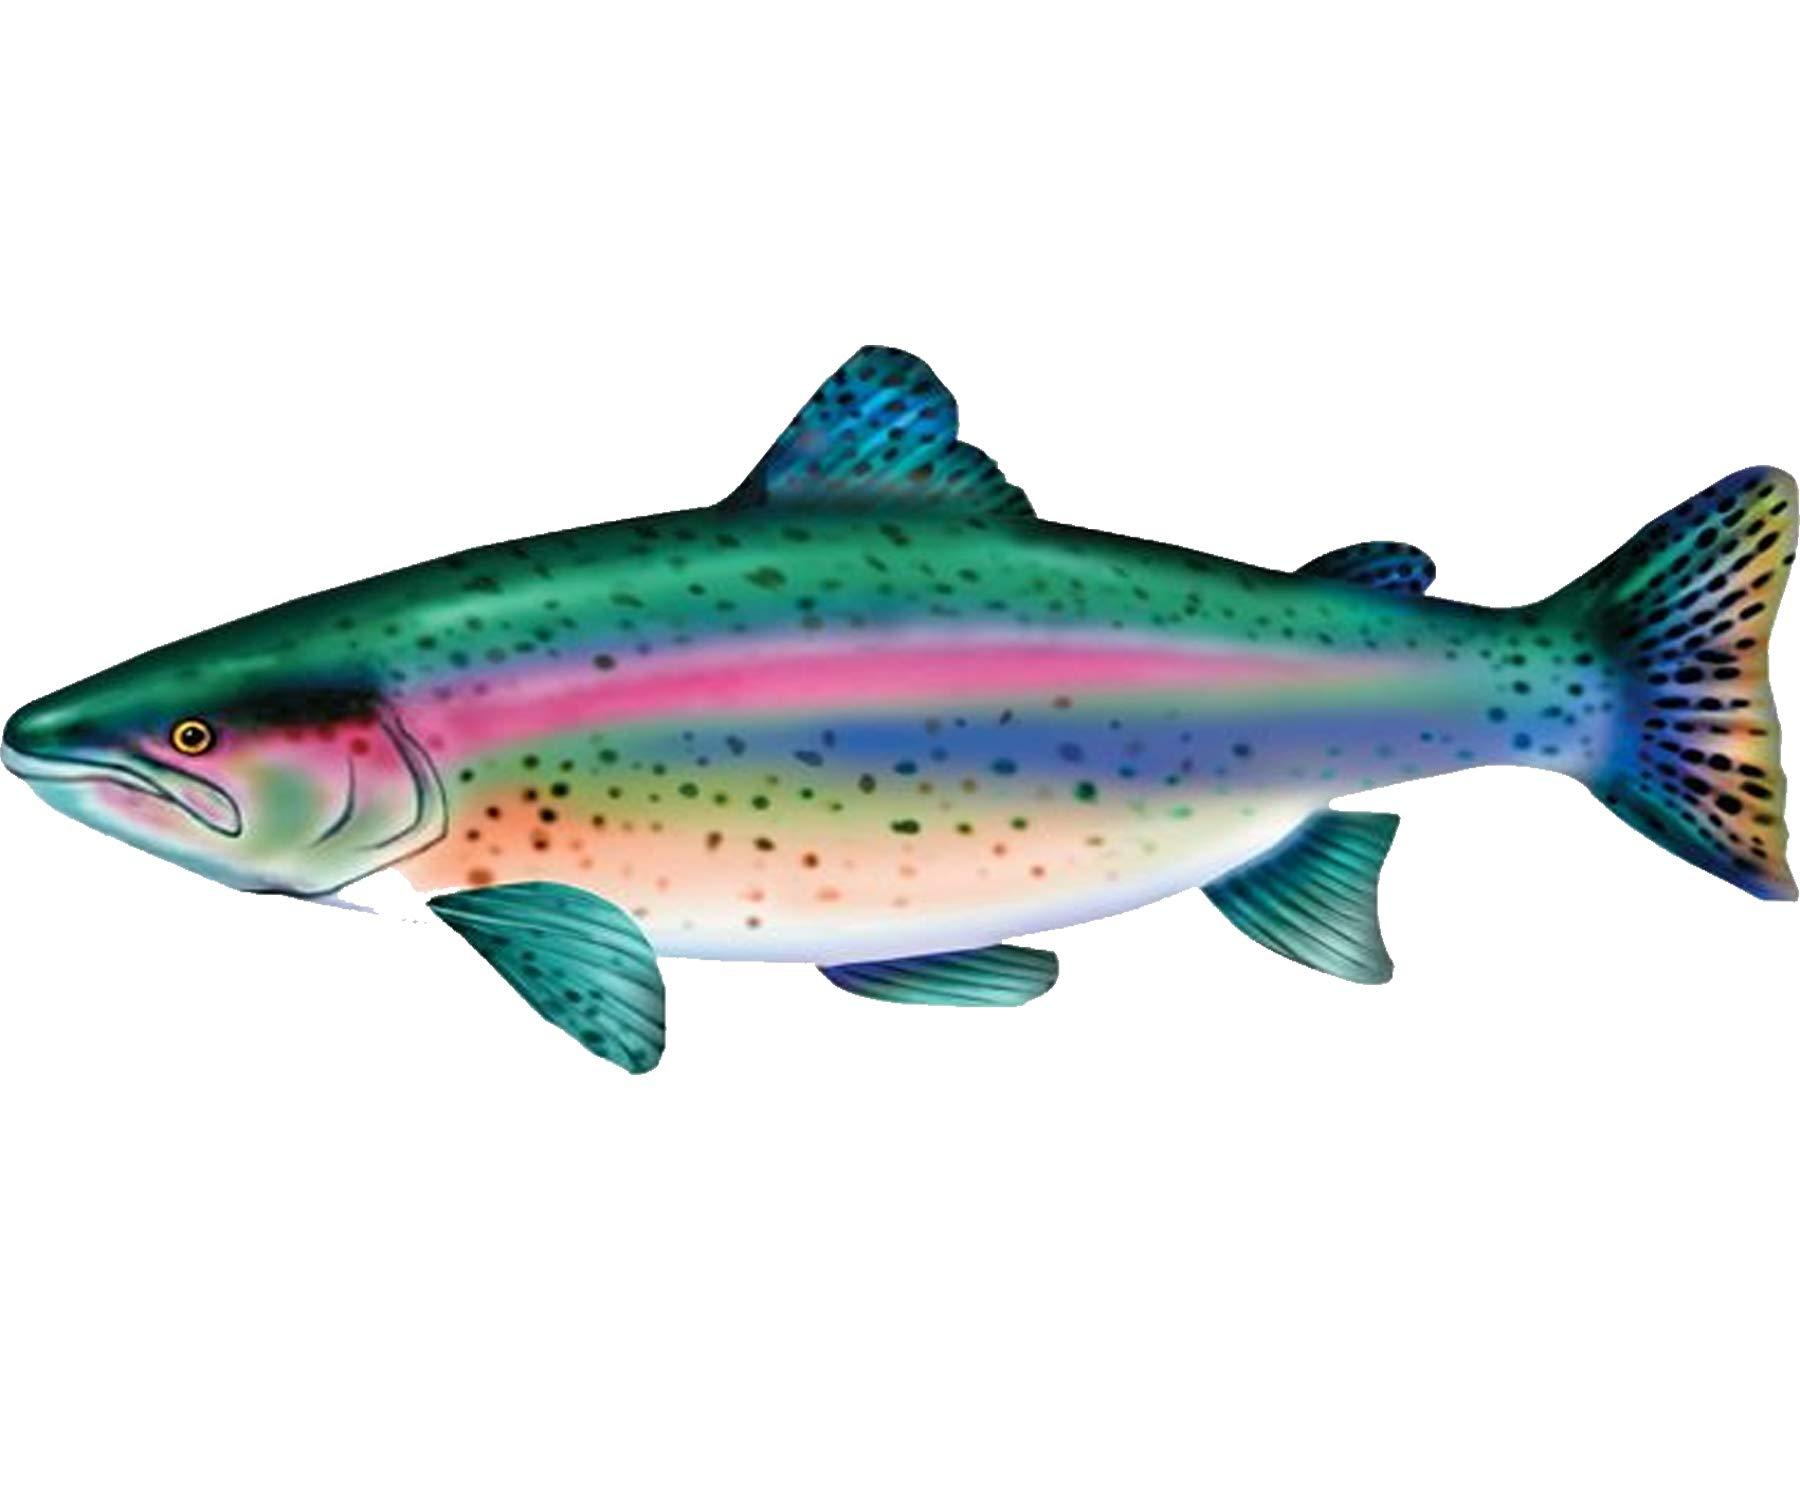 Wisechoice Stuffed Rainbow Trout Giant Lake Salmon | Fish Lounging Pillow, 4.5' Long